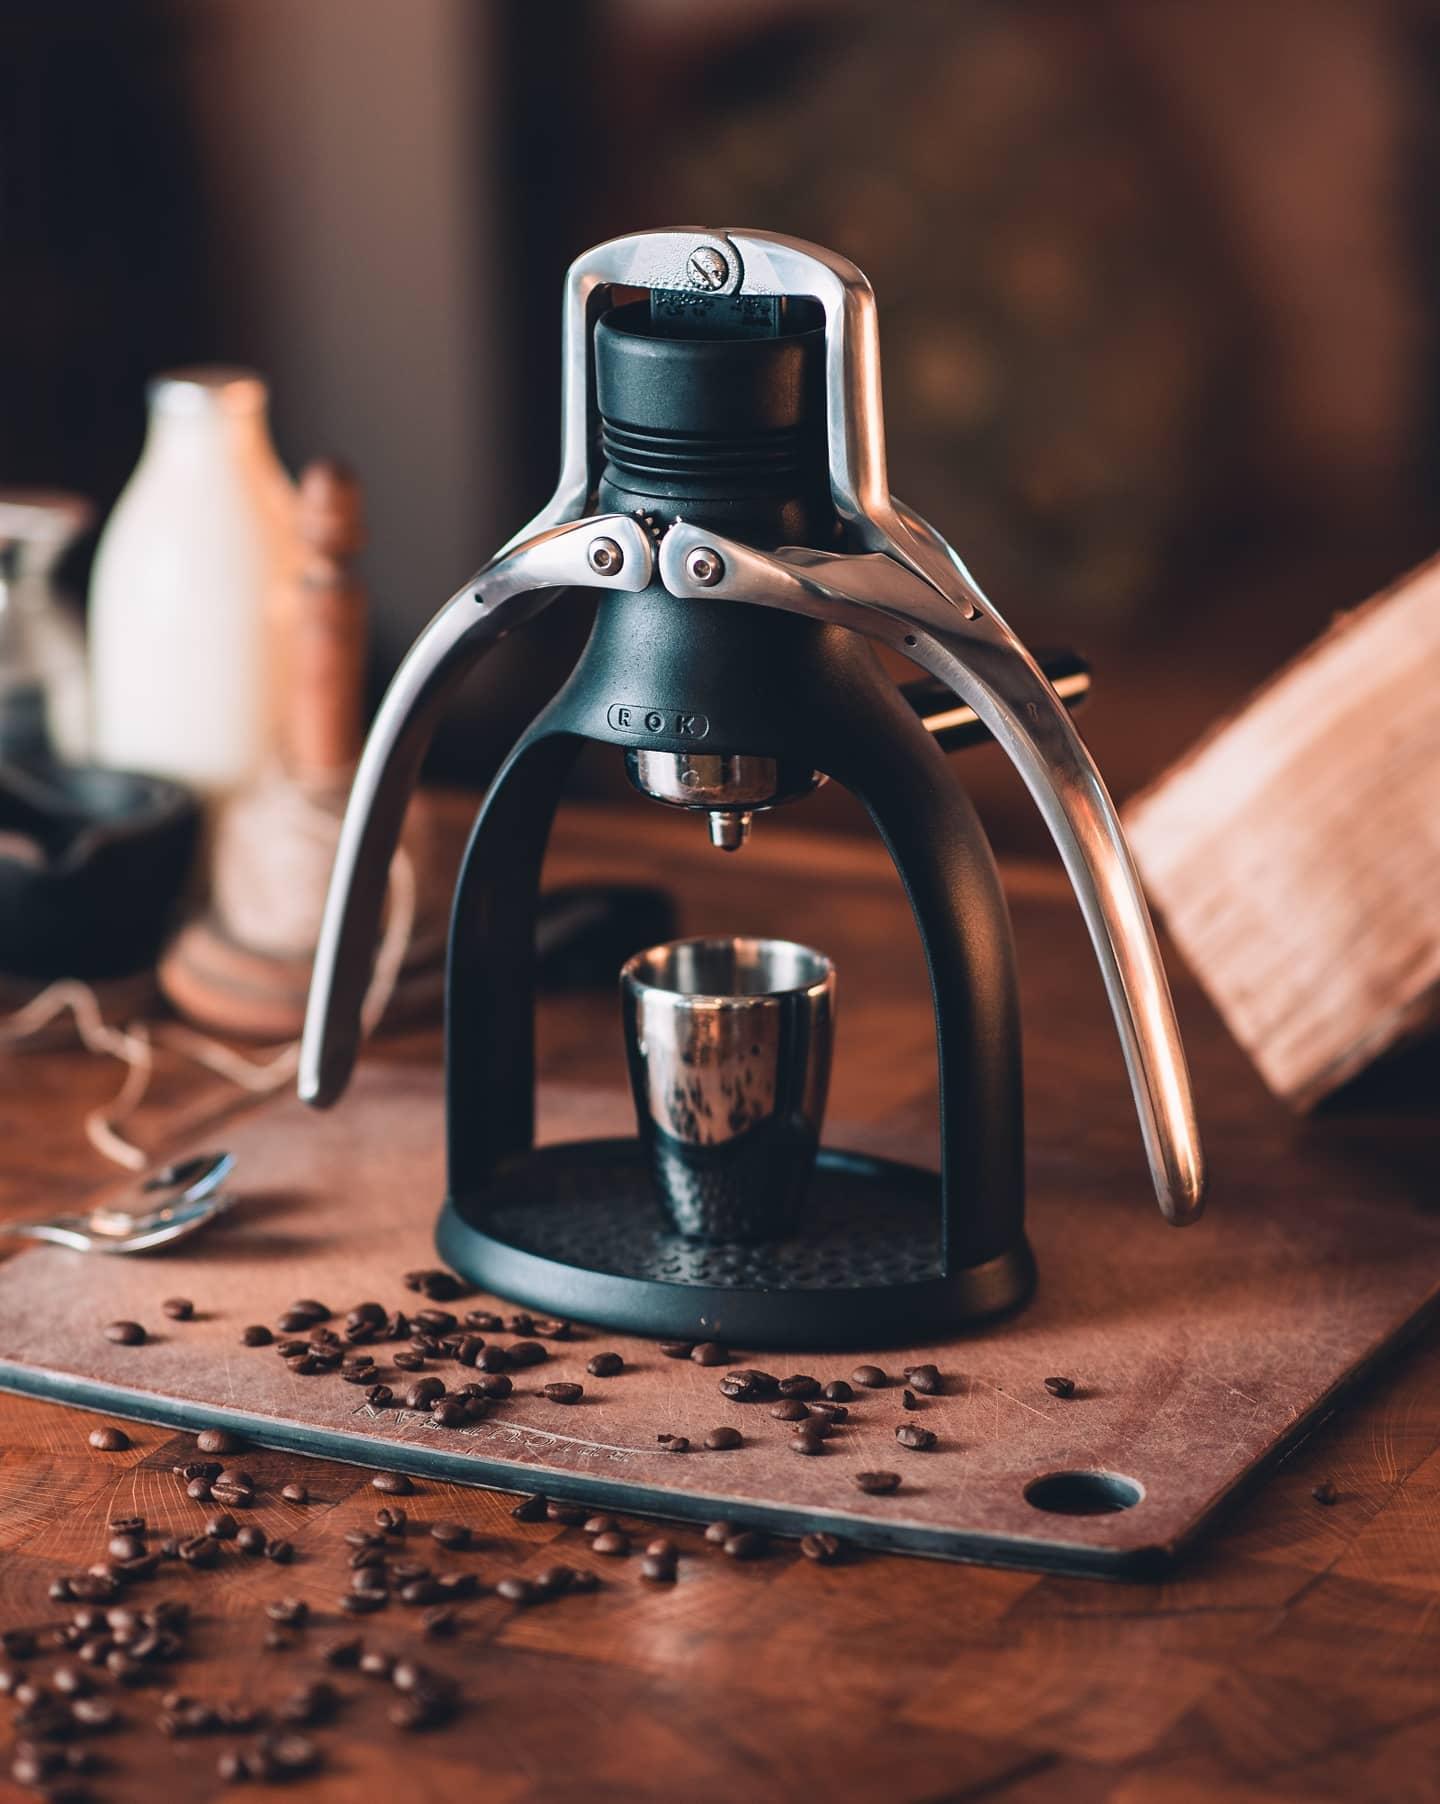 Enjoy handcrafted coffee without fuss! Make pulling down the arms of your rok part of your daily coffee routine.  #rokcoffee #homeespresso #espressolove #espressoshot #manualbrew #brewathome #espressomaker #homebarista #baristalife #blackcoffee #coffeepeople #coffeegeek #morningcoffee #morningbrew #coffeecommunity #cupofjoe #homegoods #baristagear #ROKcoffee #rokespresso